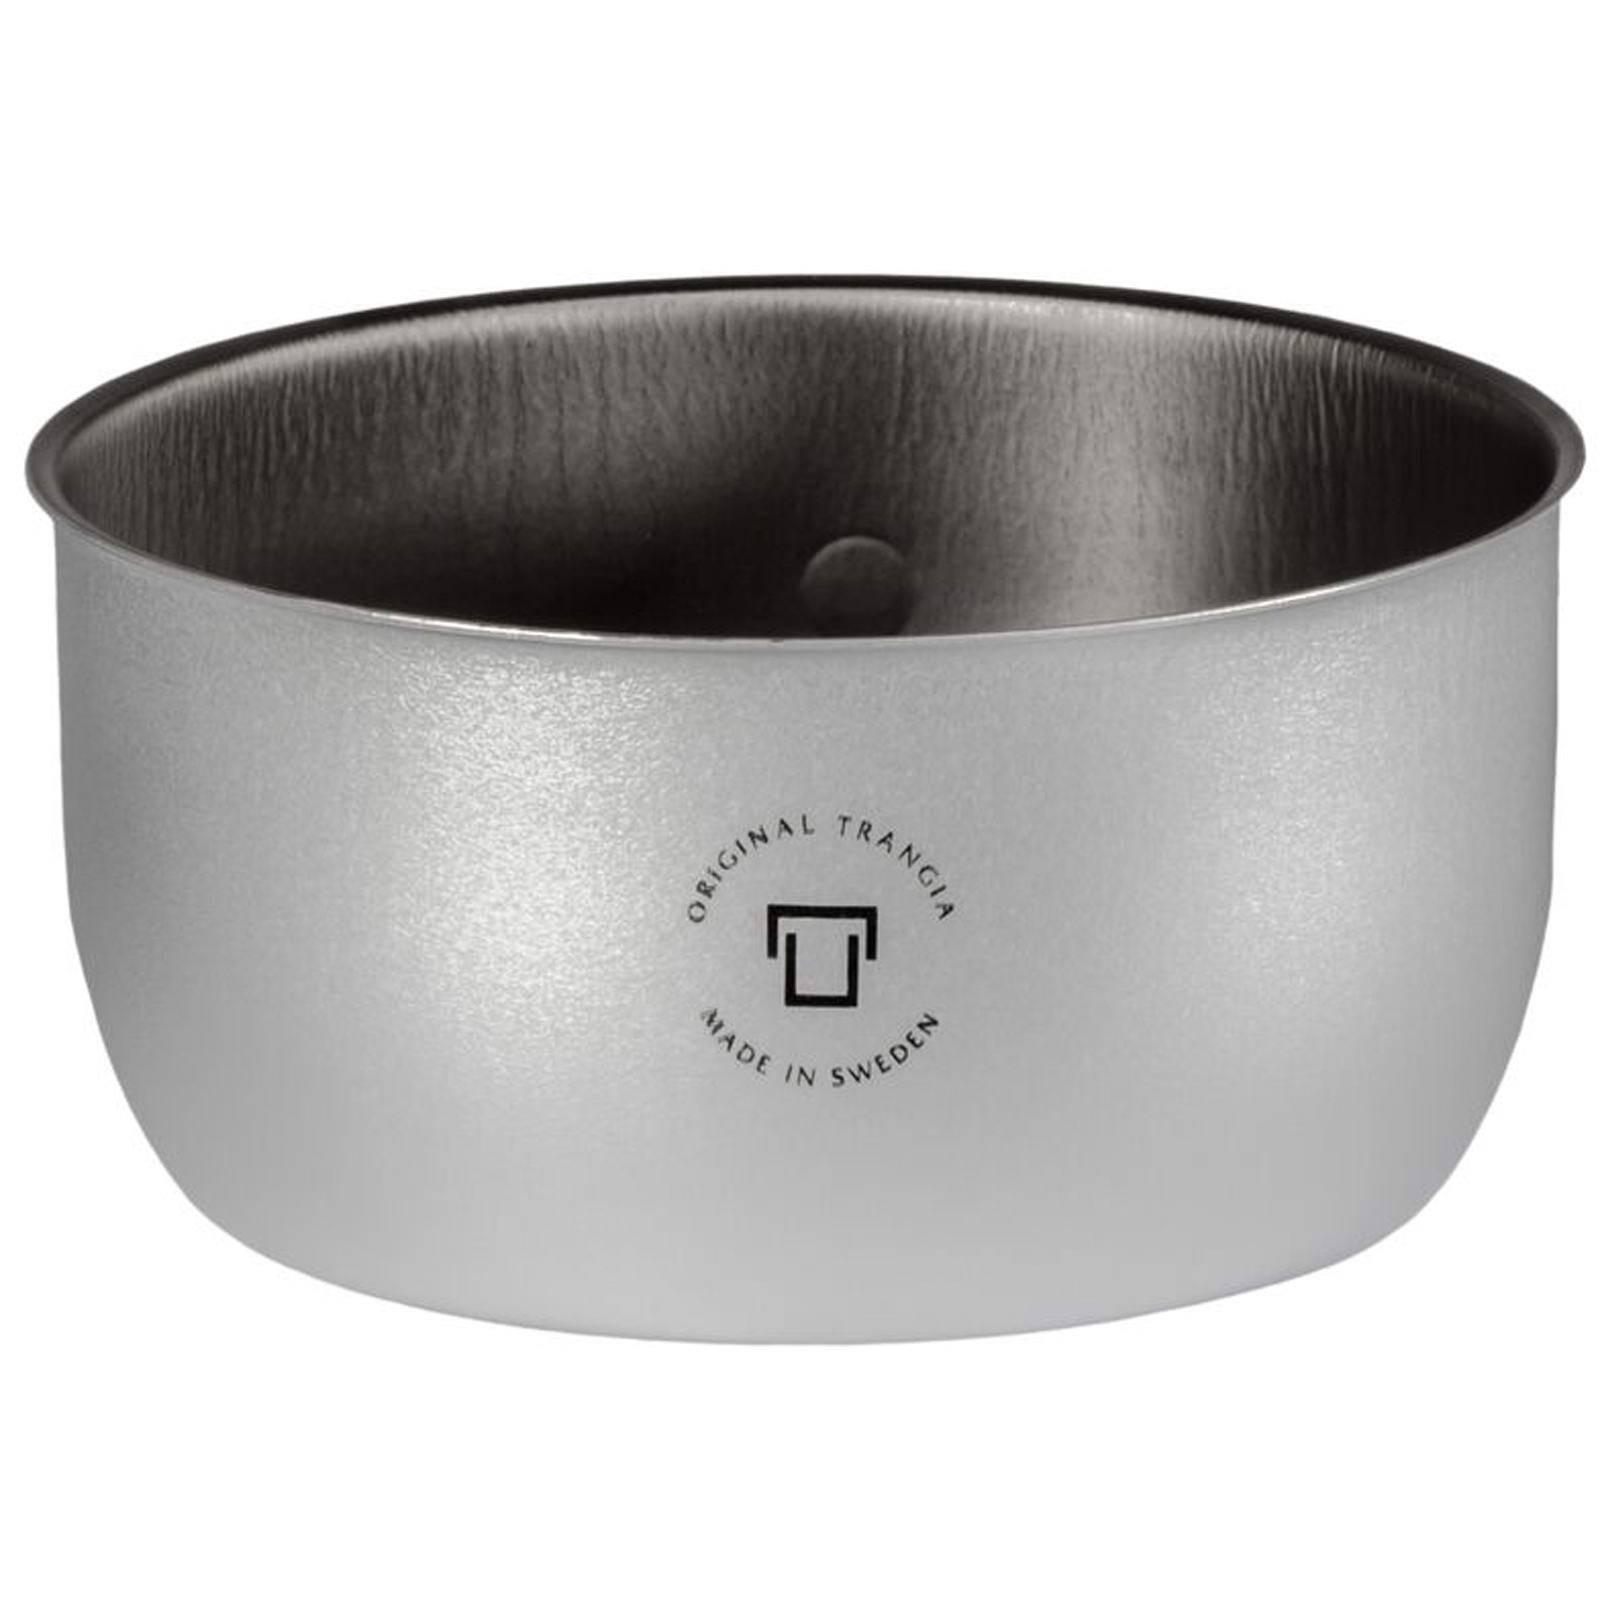 Trangia 27er Saucepan Duossal 2.0 - 1 Liter Topf innen - Bild 1